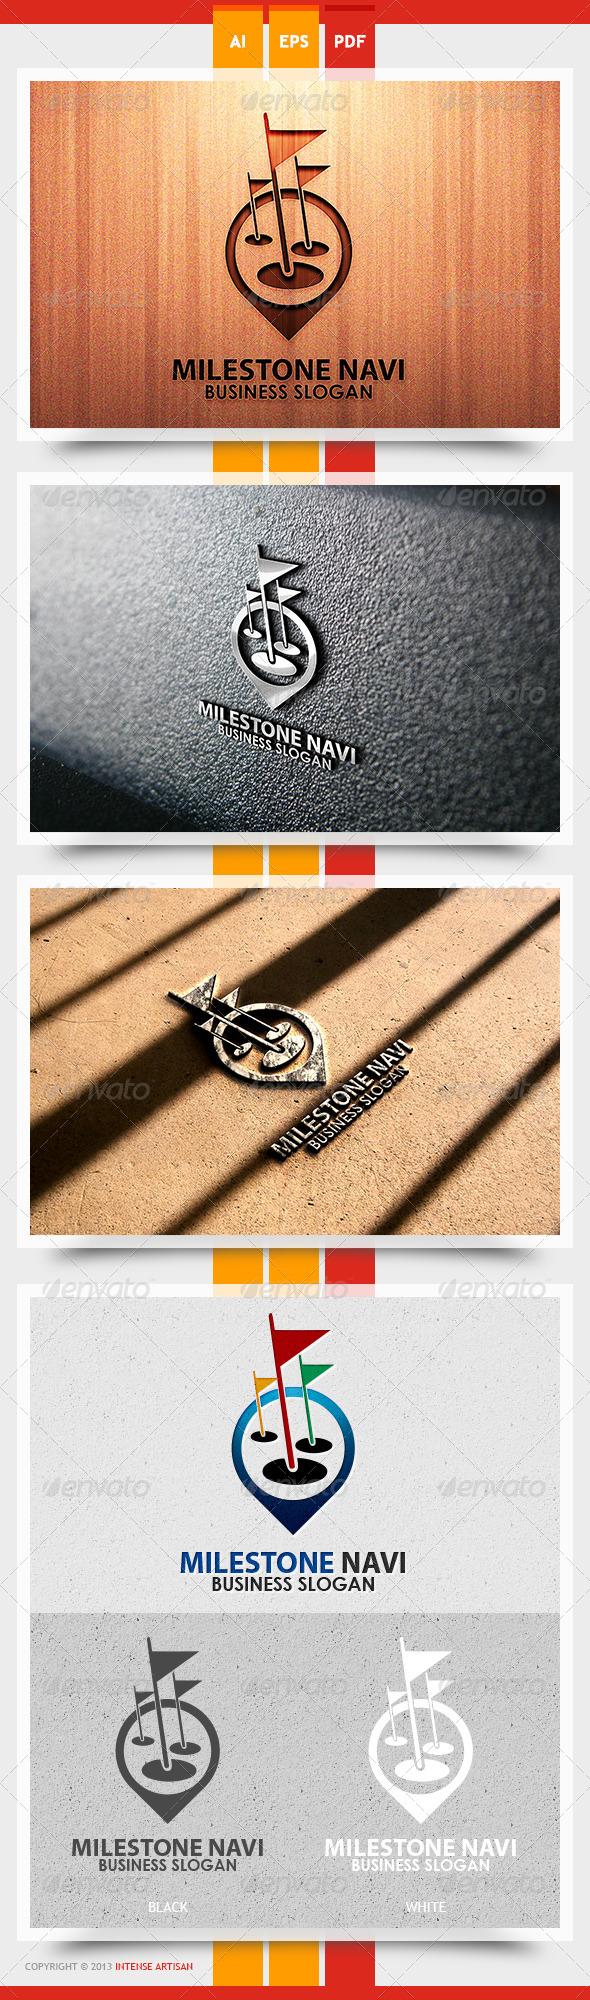 Milestone Navi Logo Template - Objects Logo Templates